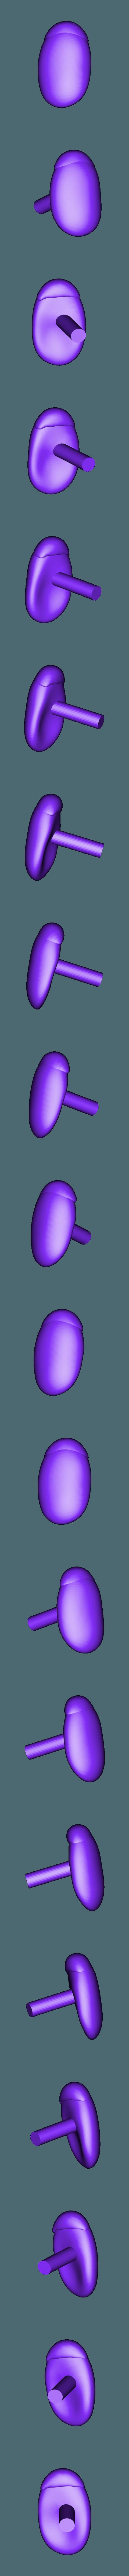 right_eye.stl Download free STL file Mr. Potato Head [Toy Story] • 3D printer template, Dream_it_Model_it